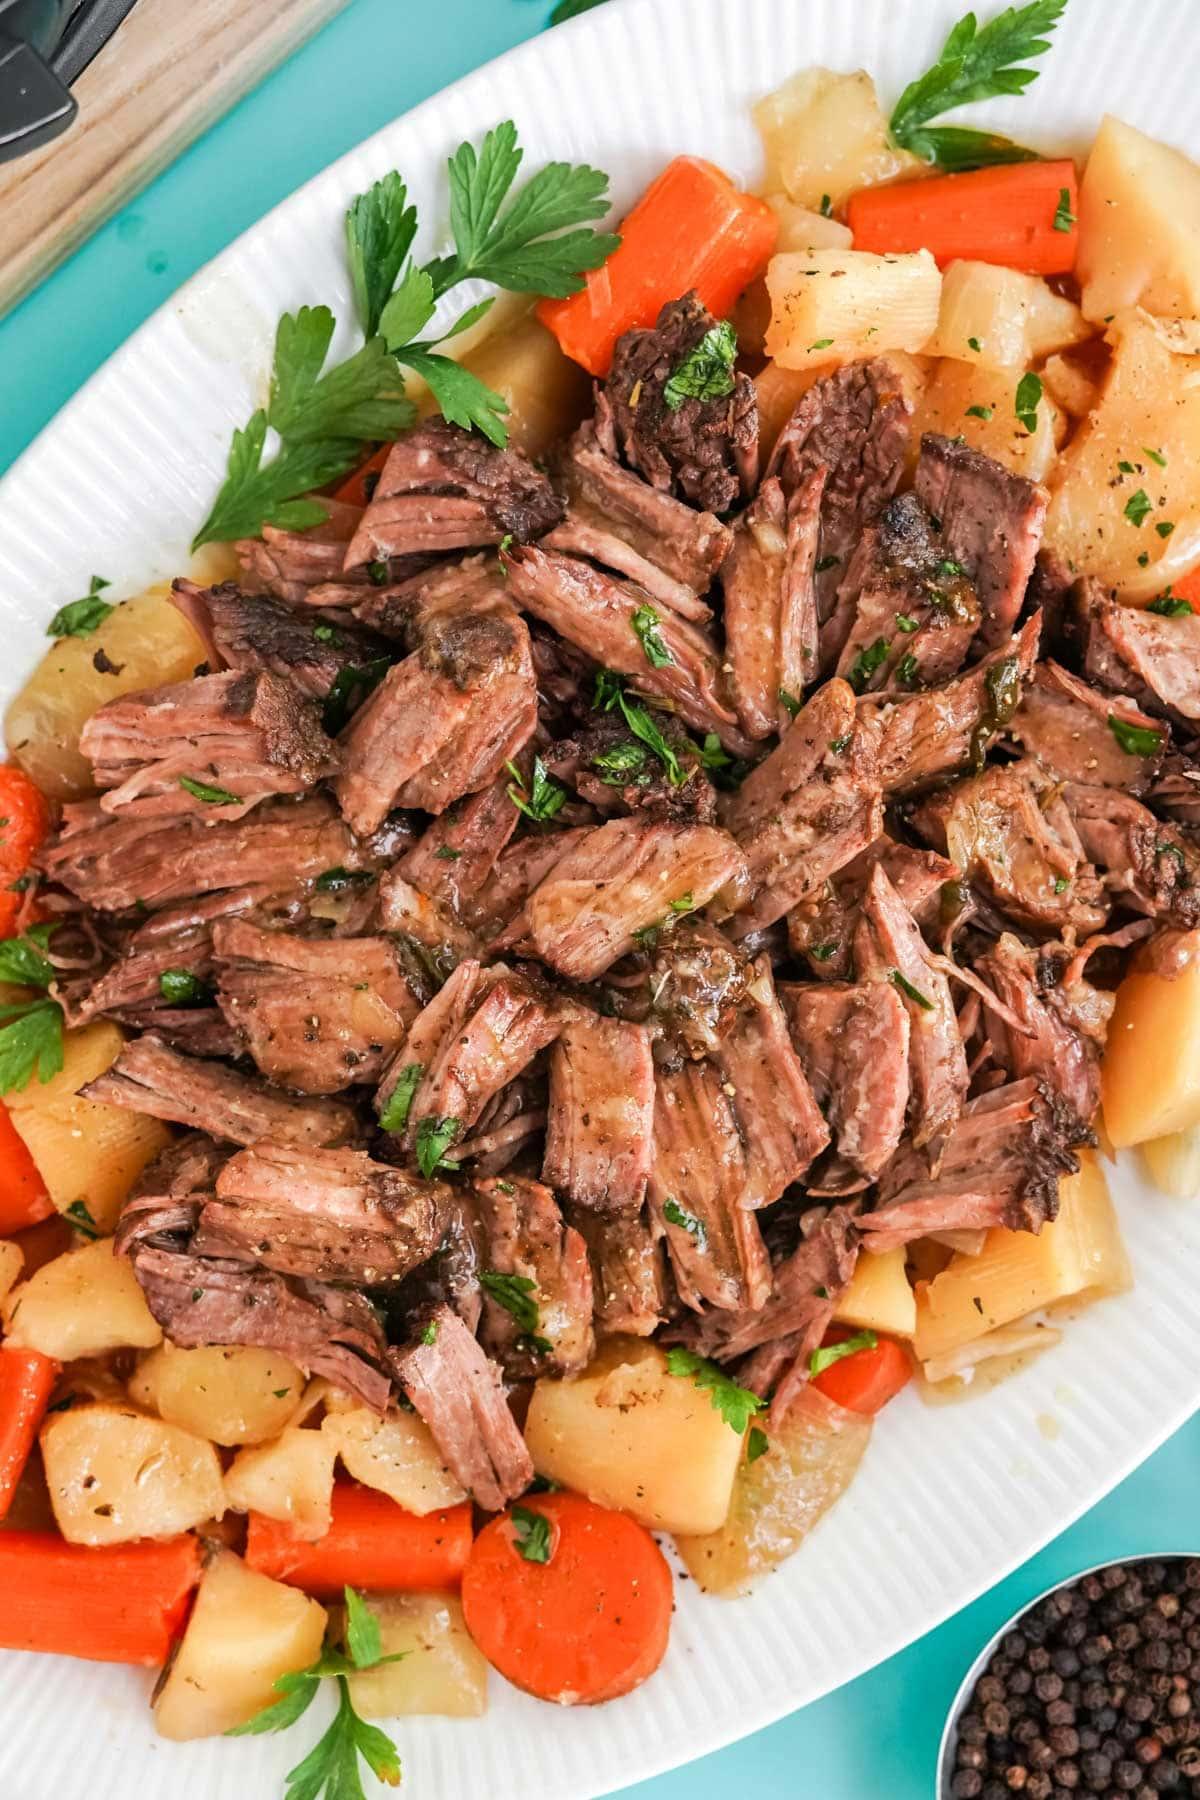 shredded pot roast, carrots and potatoes on a platter